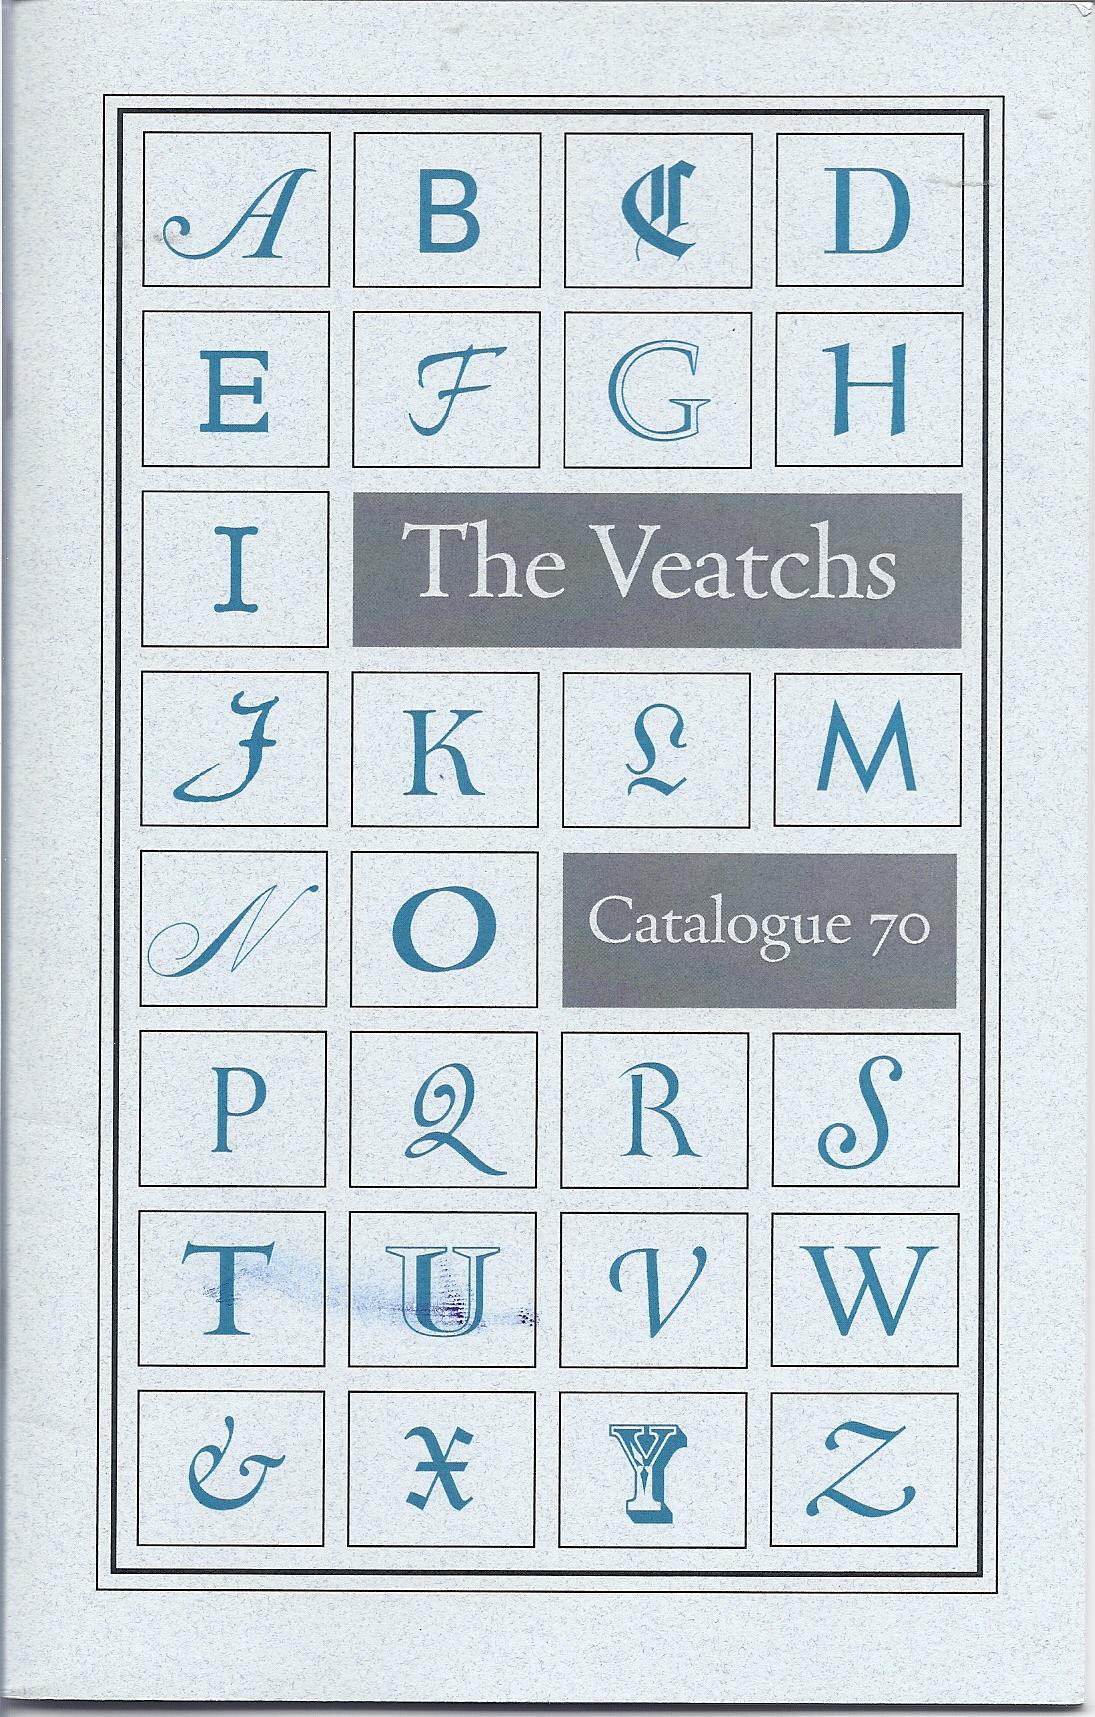 Veatchs70